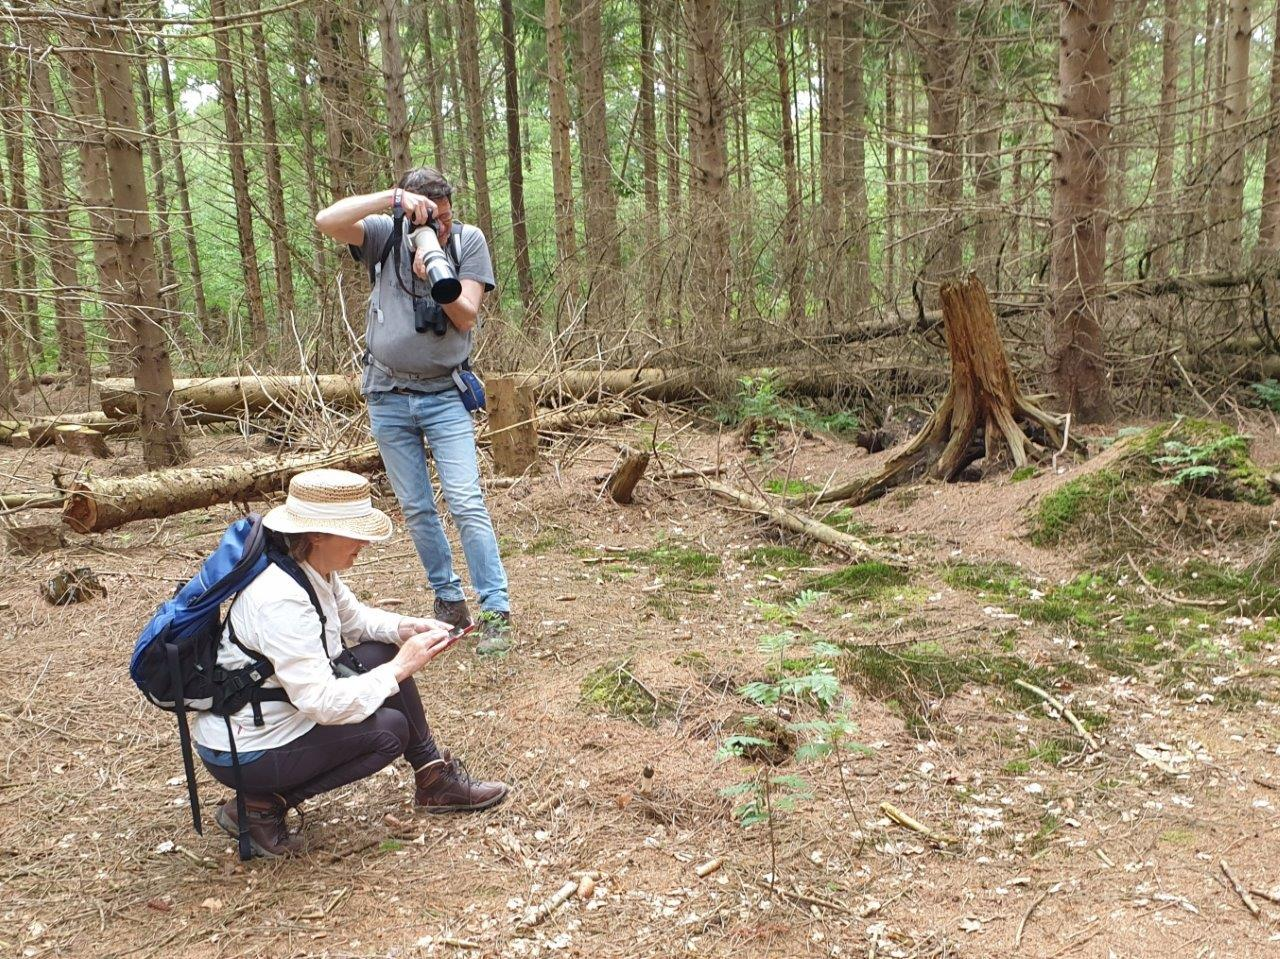 Fotograferen van paddenstoel